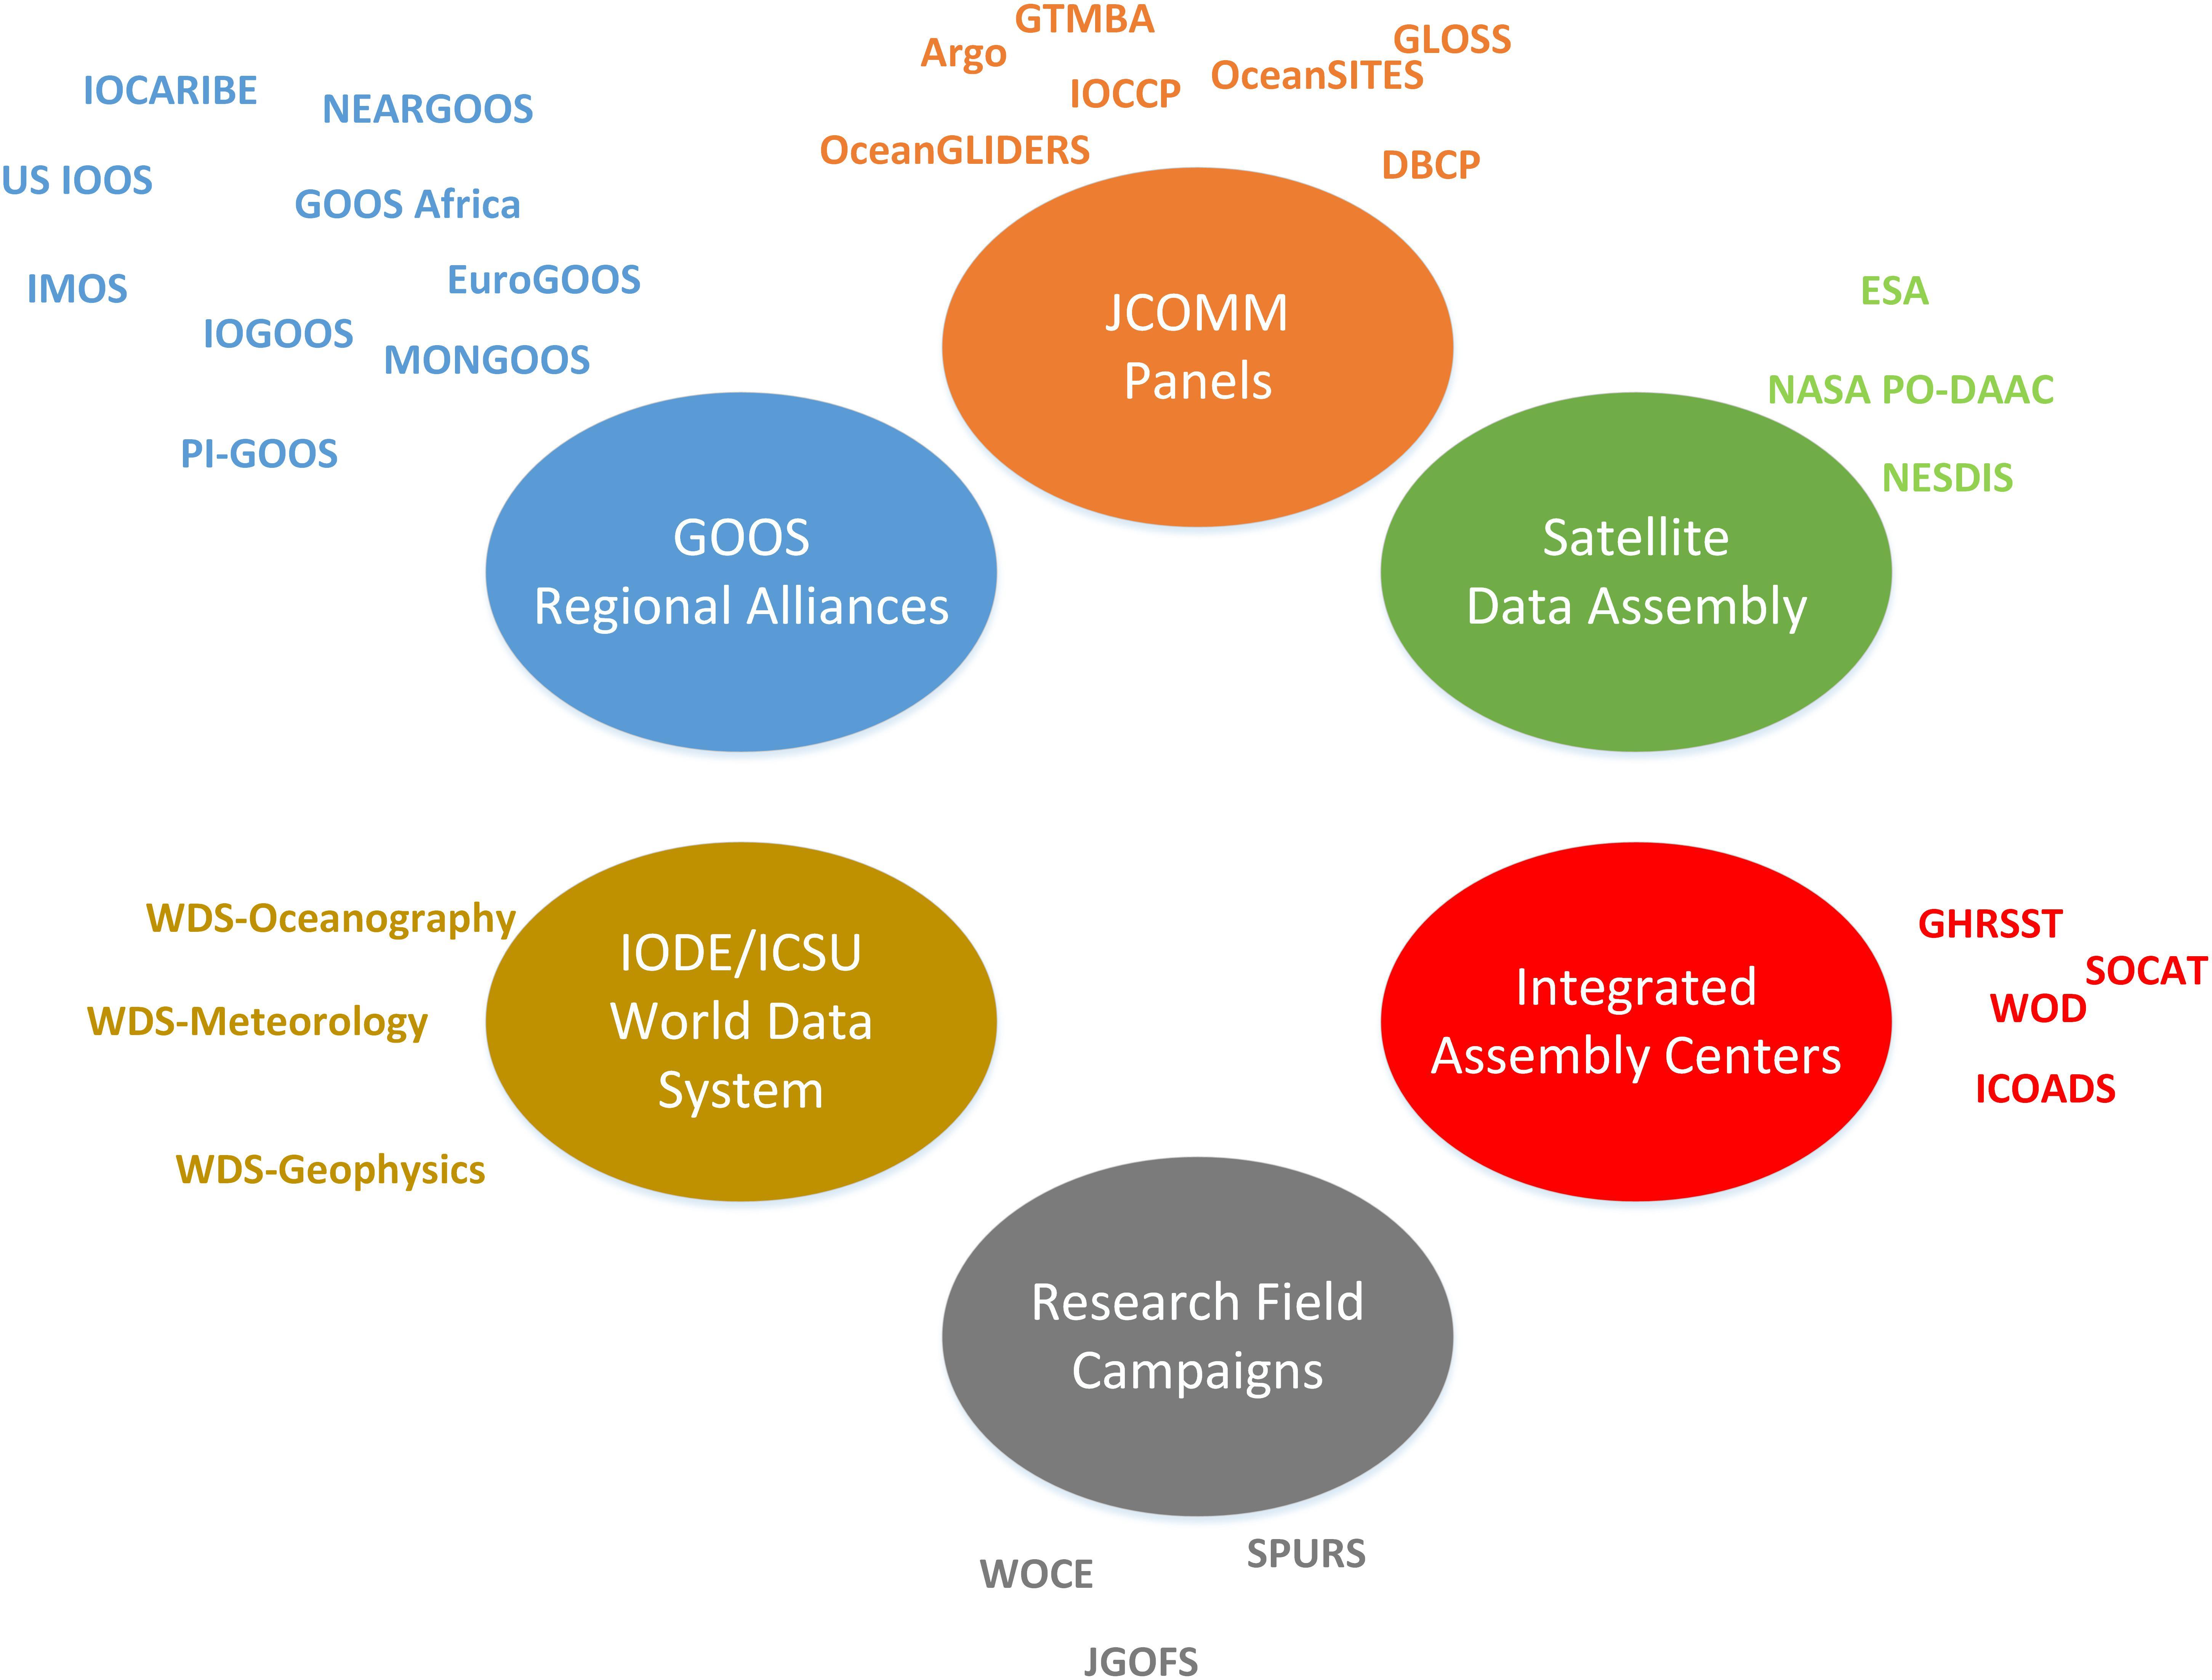 Frontiers | Data Interoperability Between Elements of the Global